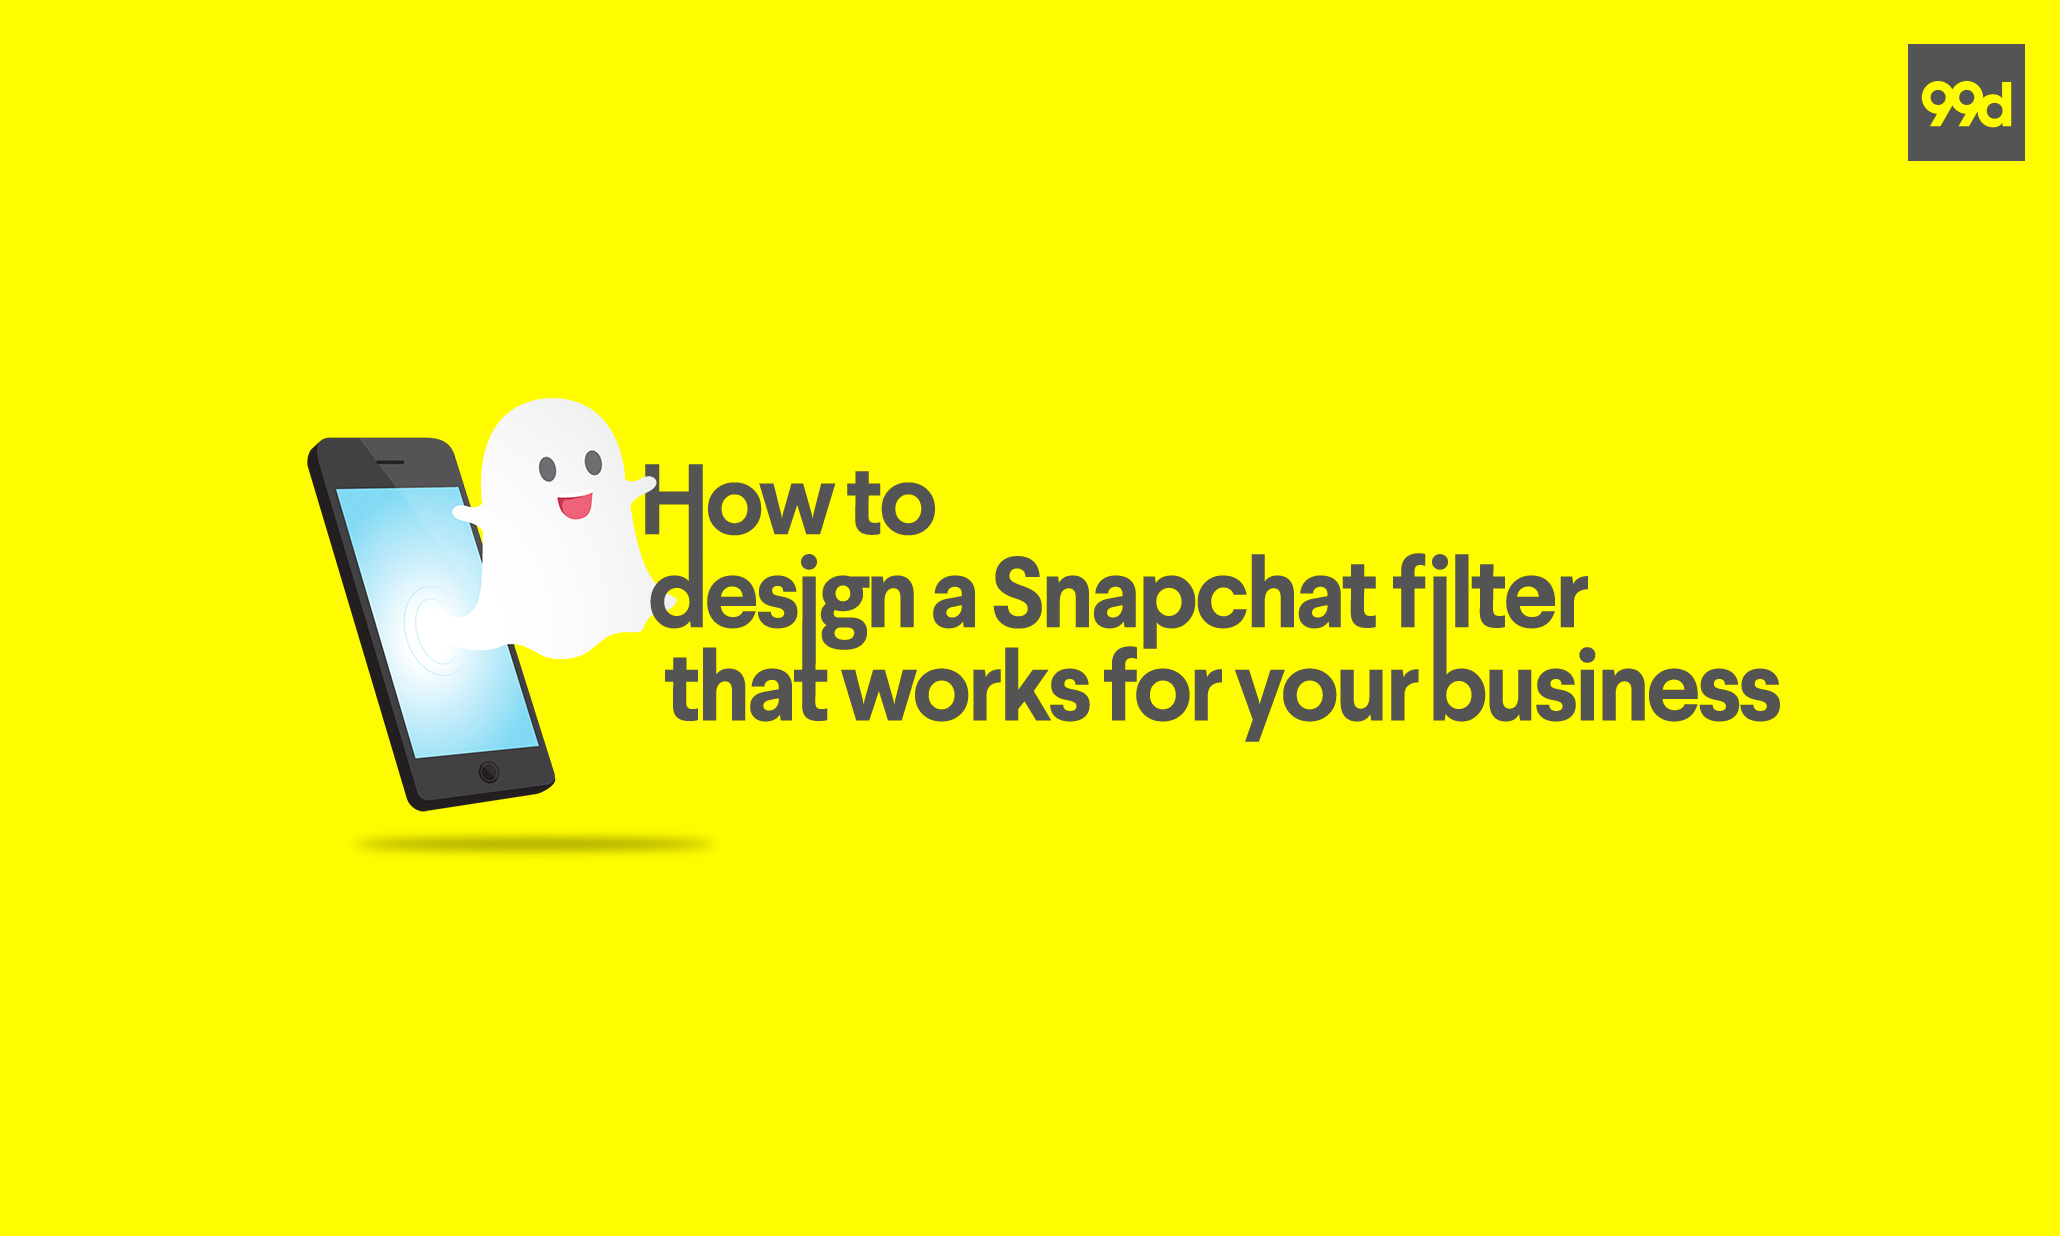 Snapchat office email address